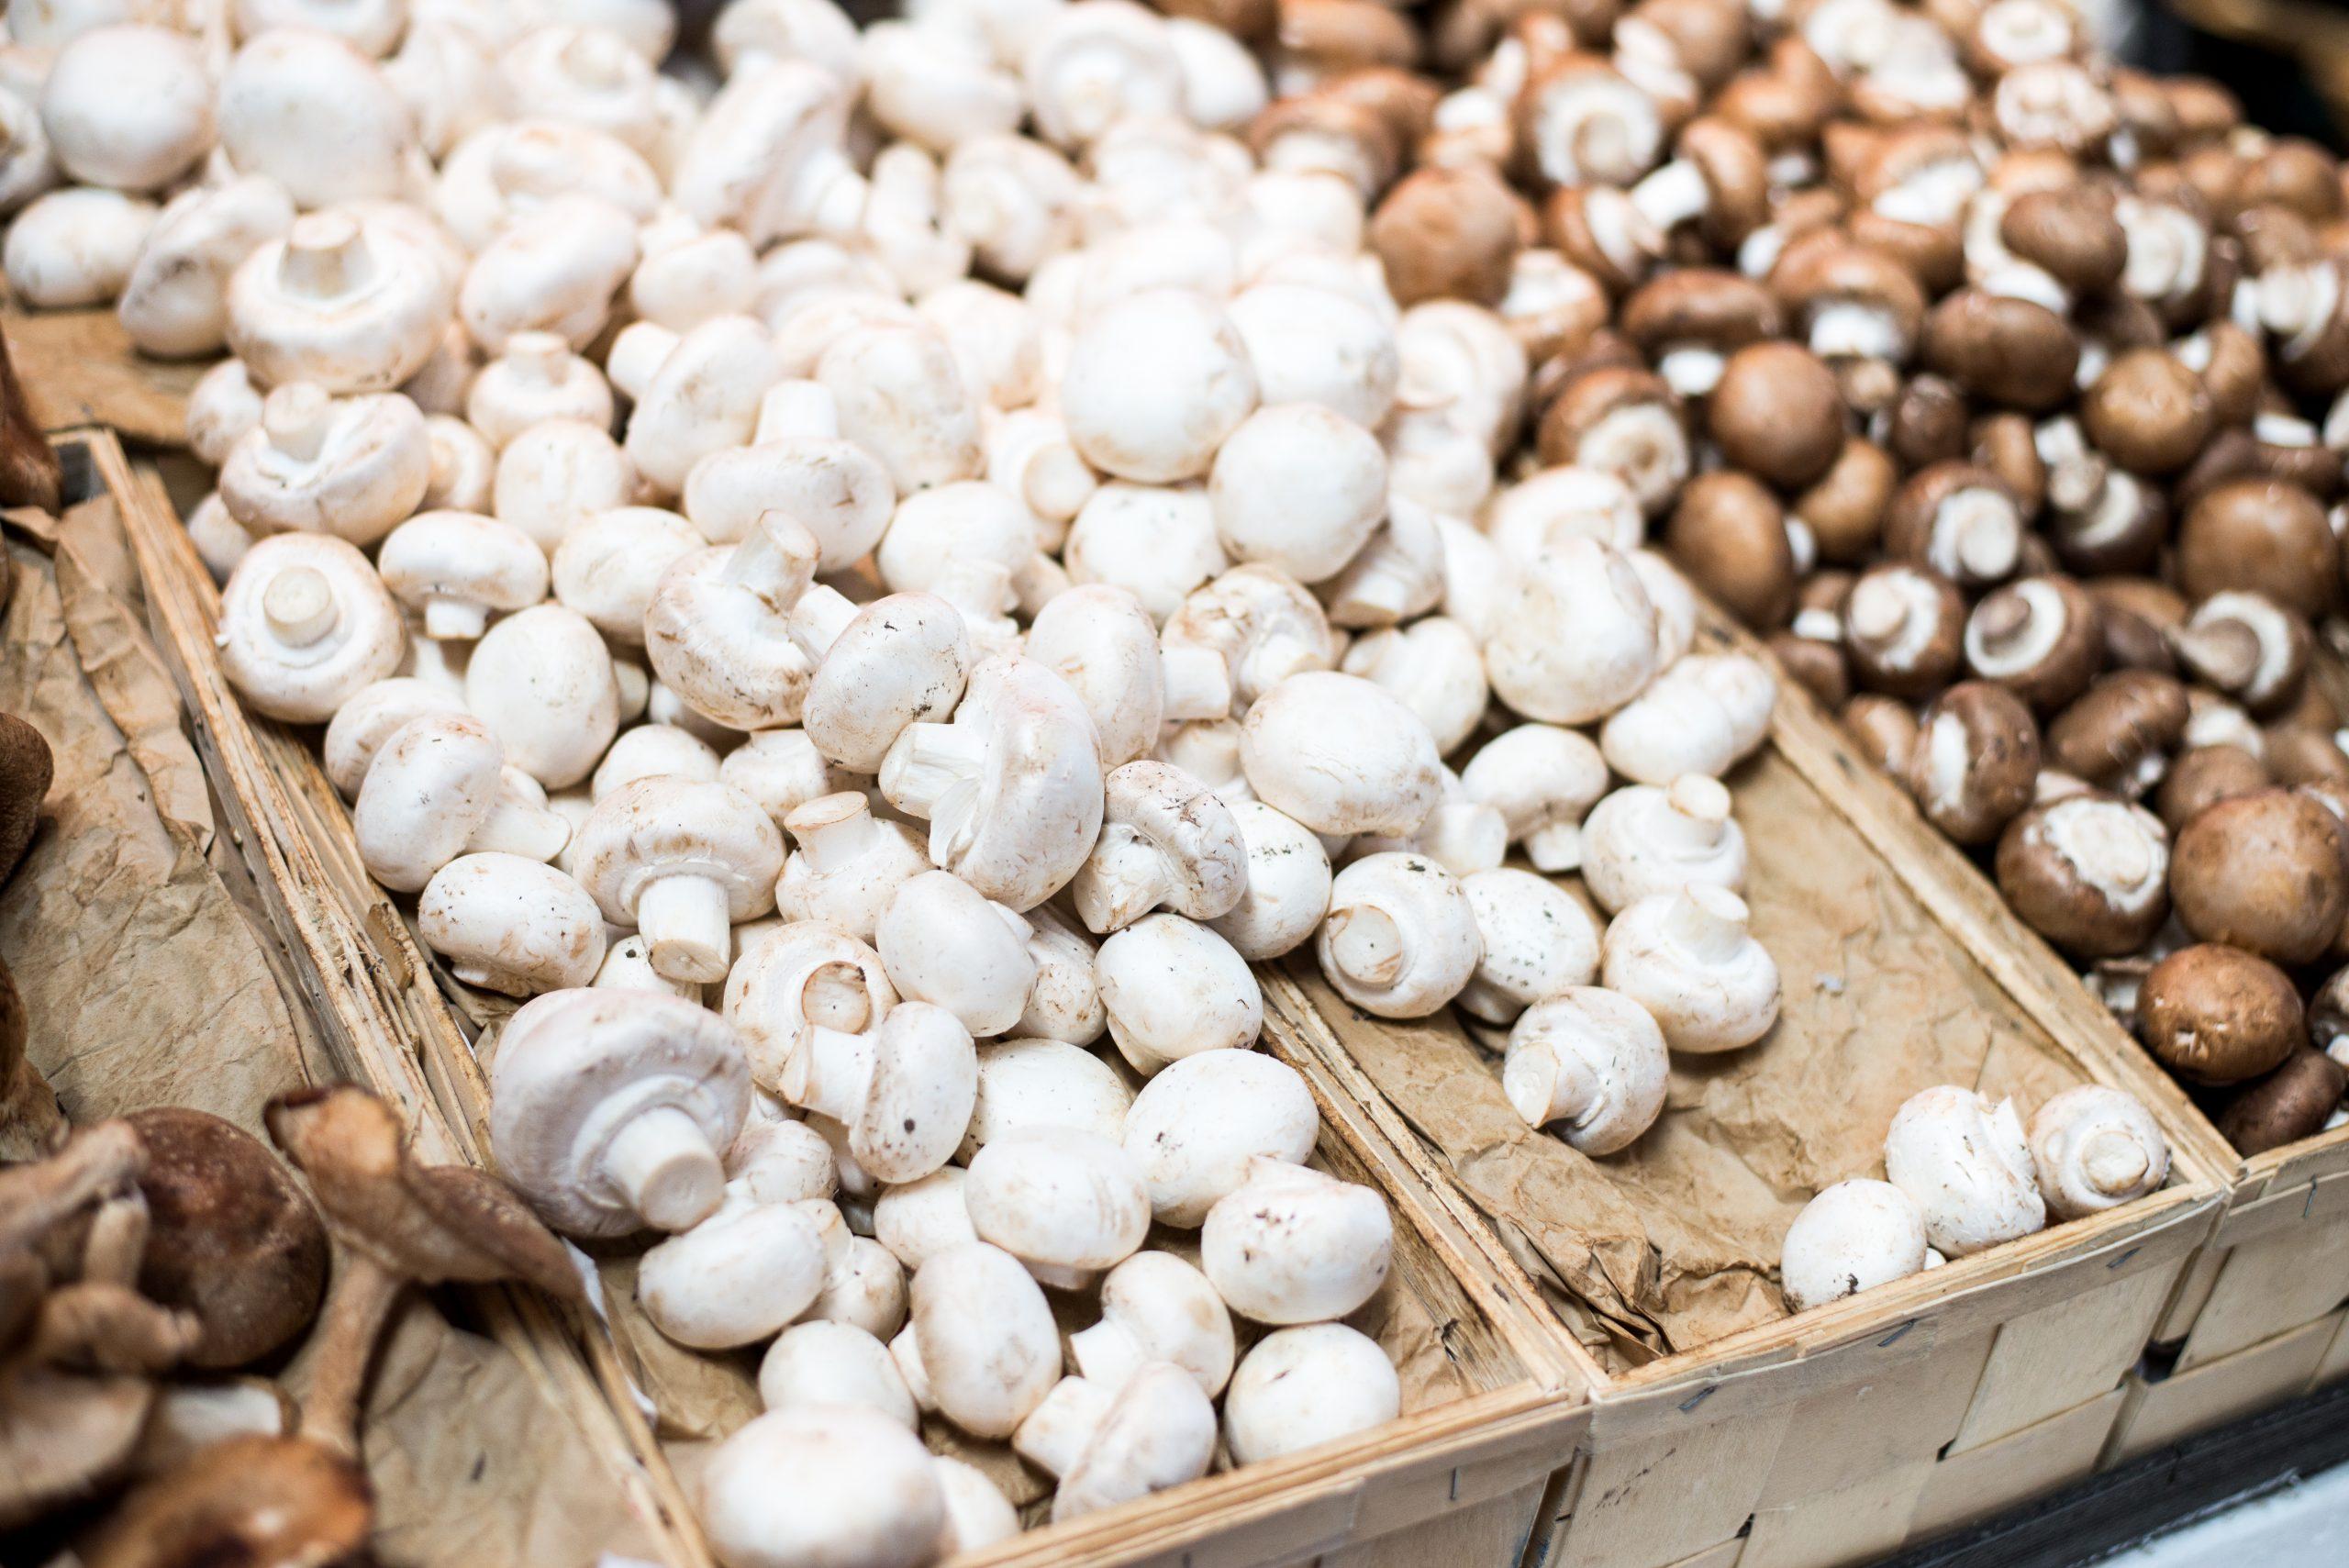 Mushrooms at the market